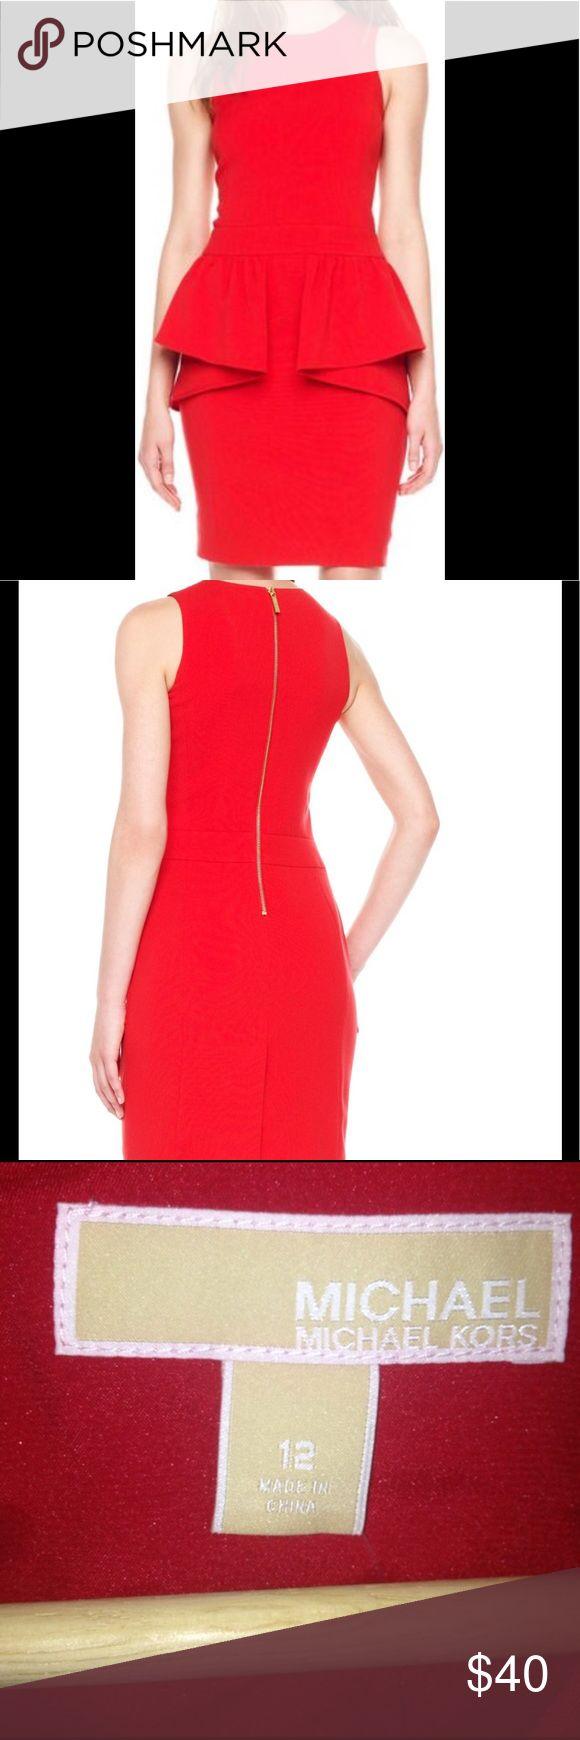 Michael Kors Red Peplum Dress NWT | Michael Kors | Size 12 | Sleeveless | Red | Peplum Smoke and Pet Free Home MICHAEL Michael Kors Dresses